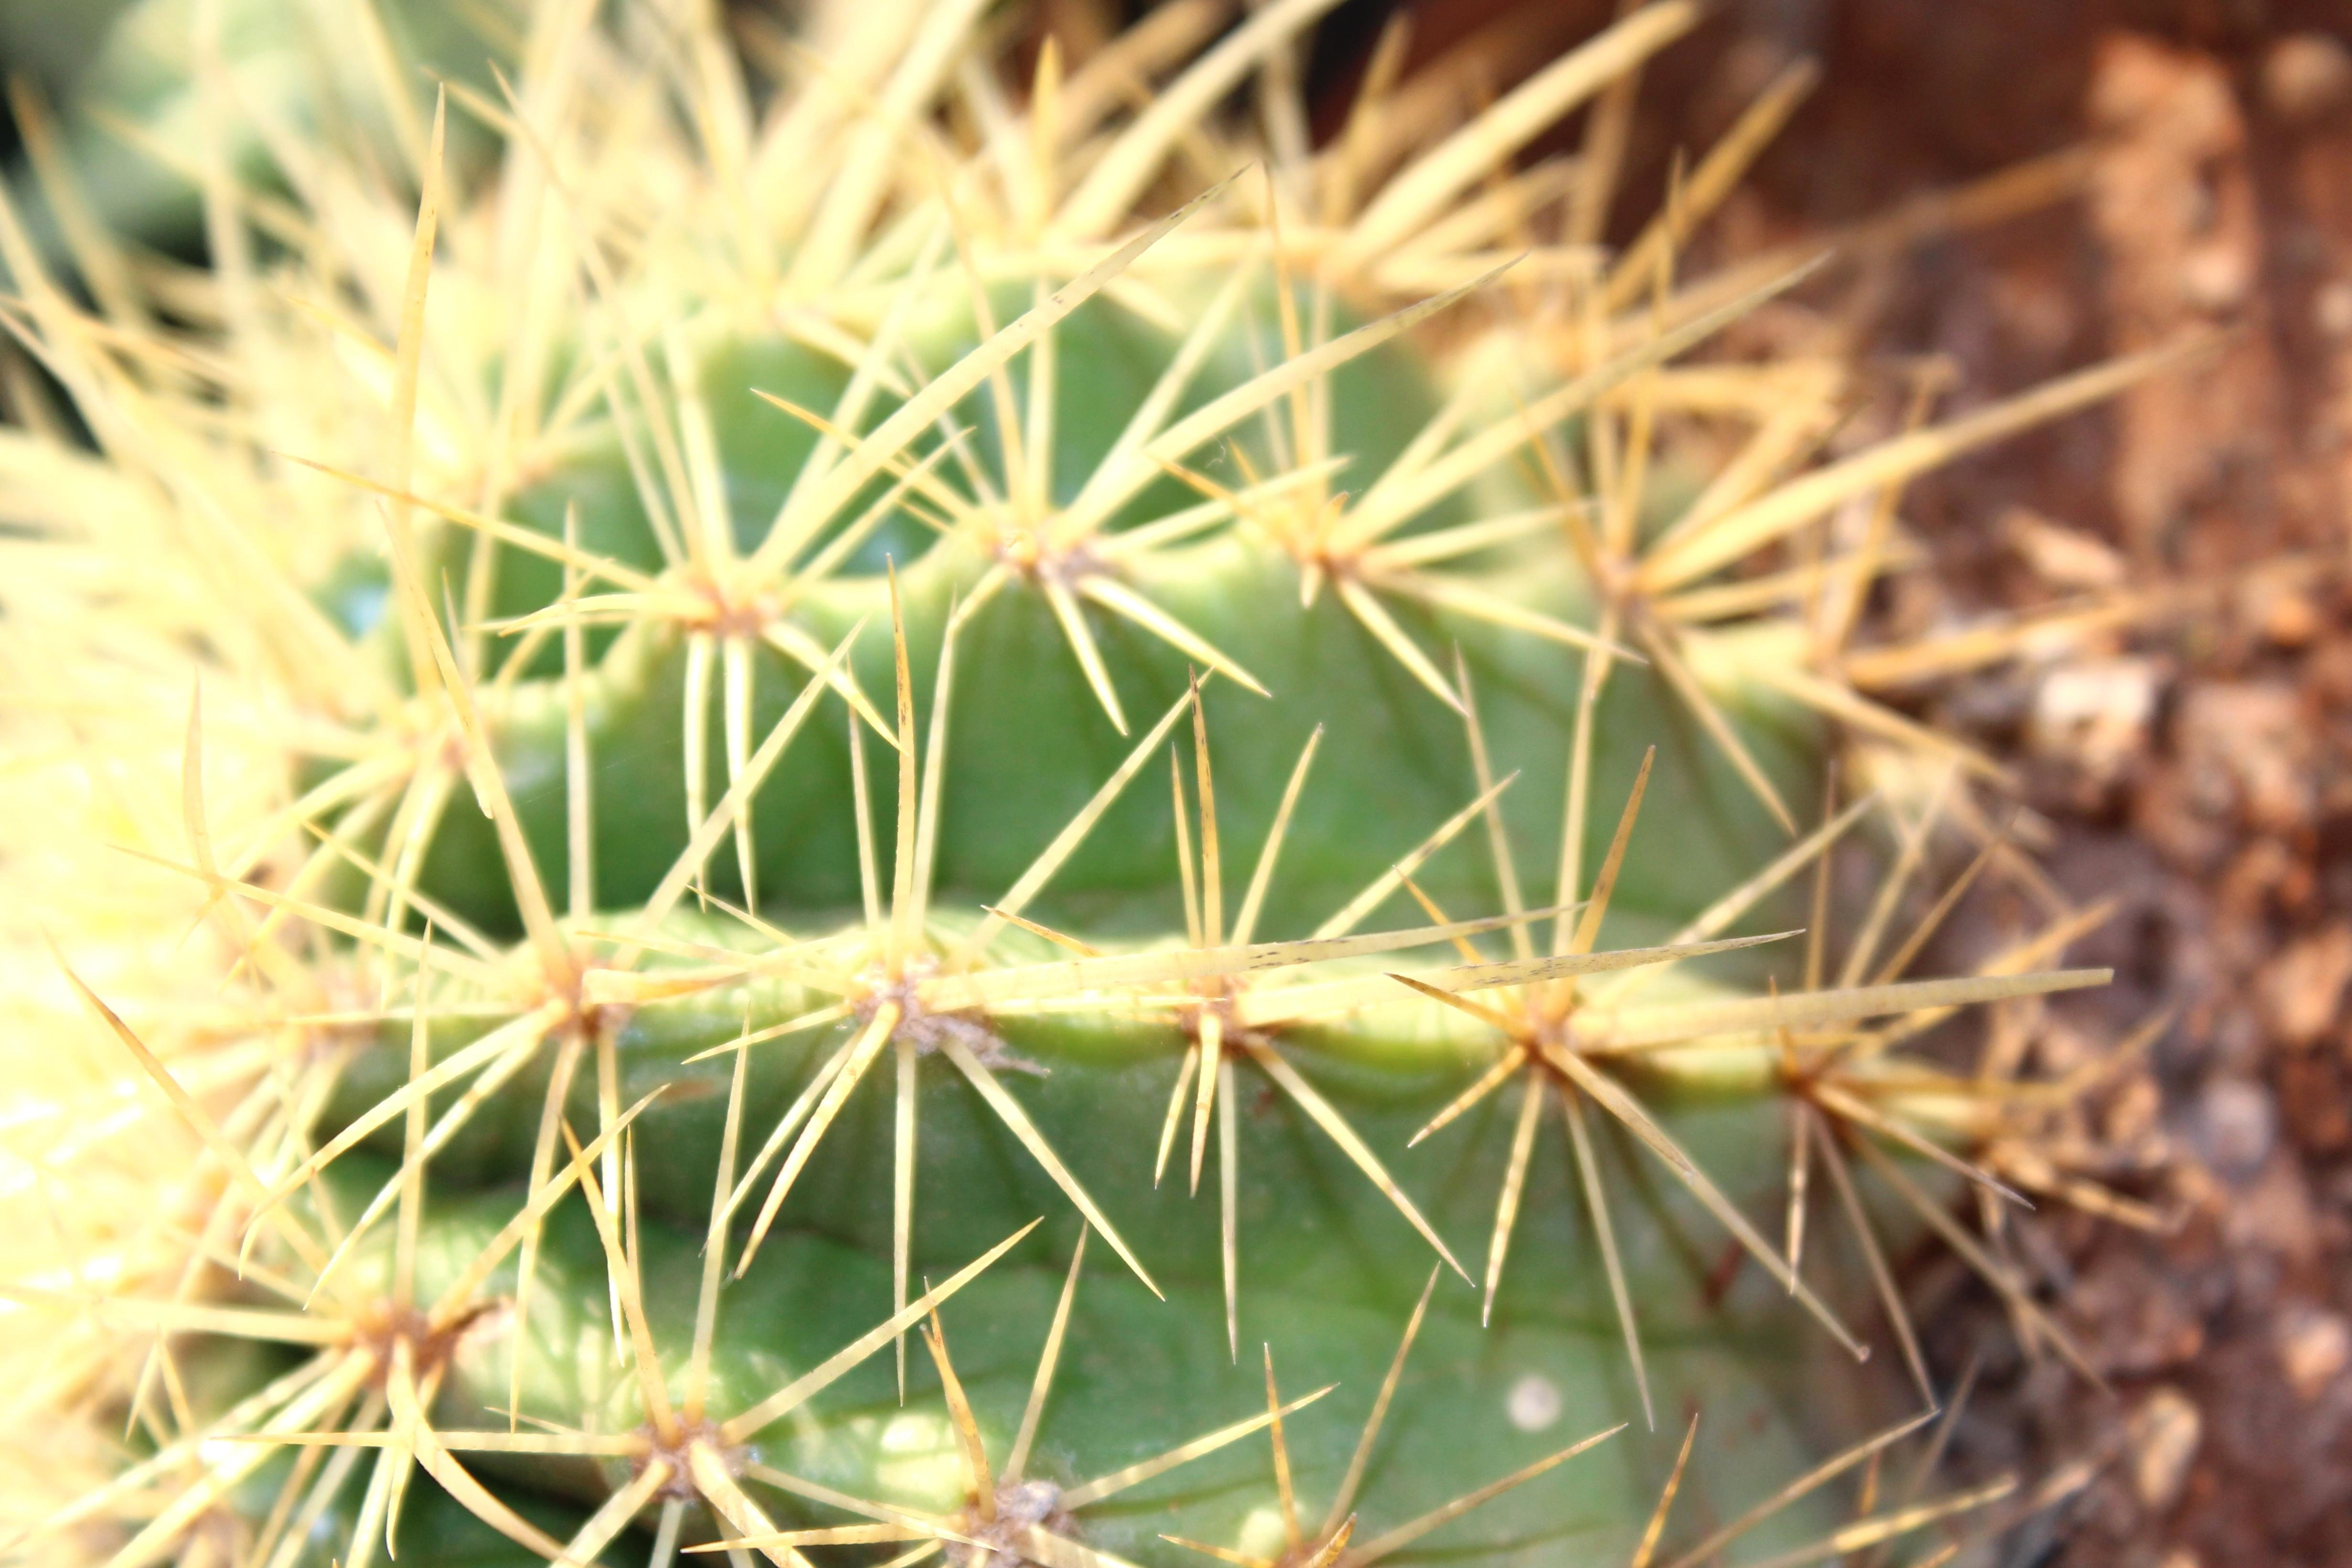 kostenlose bild dorn pflanze kaktus makro. Black Bedroom Furniture Sets. Home Design Ideas